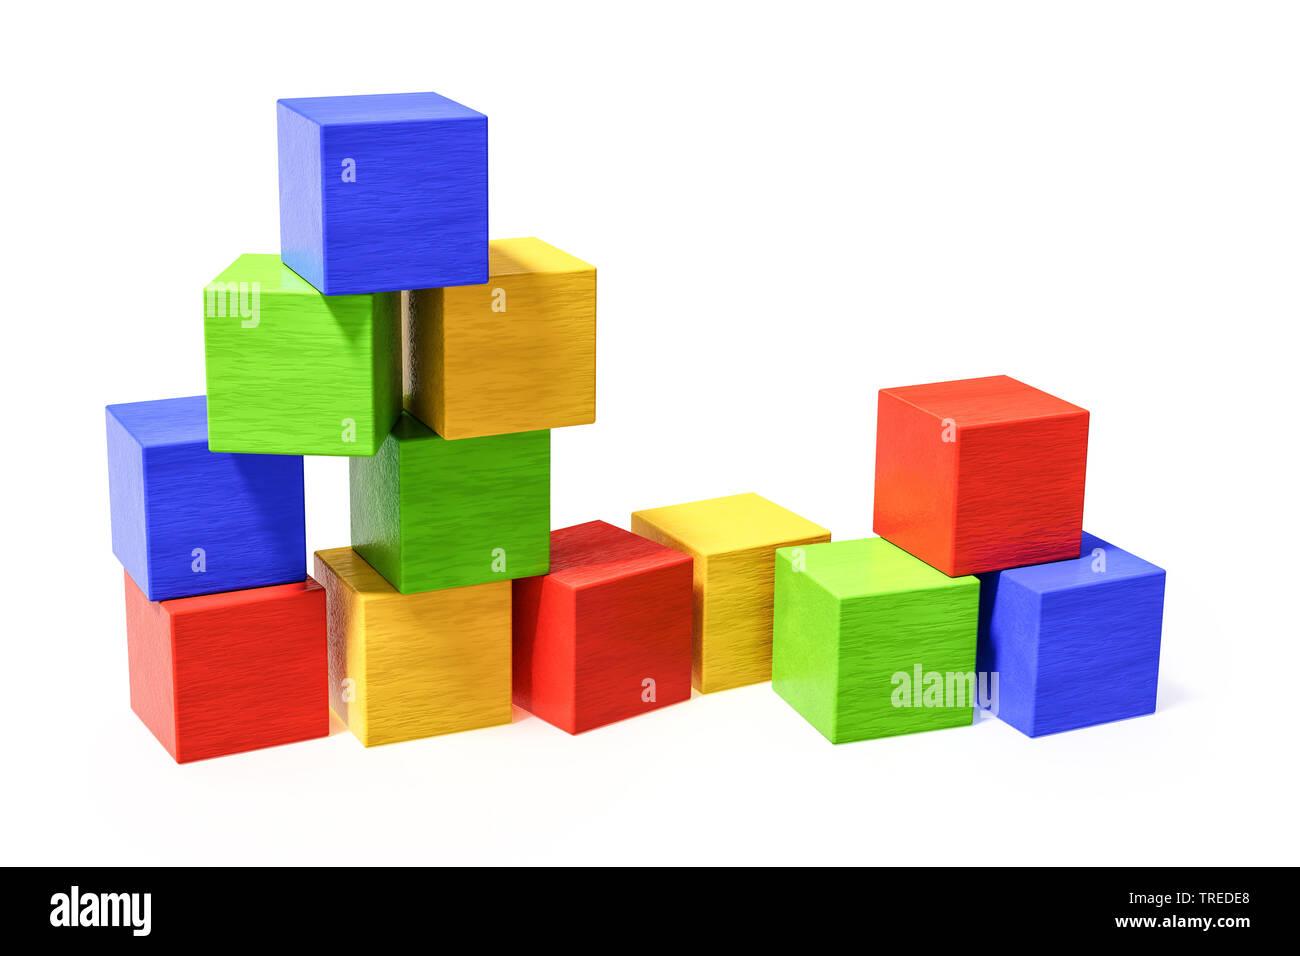 Wooden Bricks Stock Photos & Wooden Bricks Stock Images - Alamy